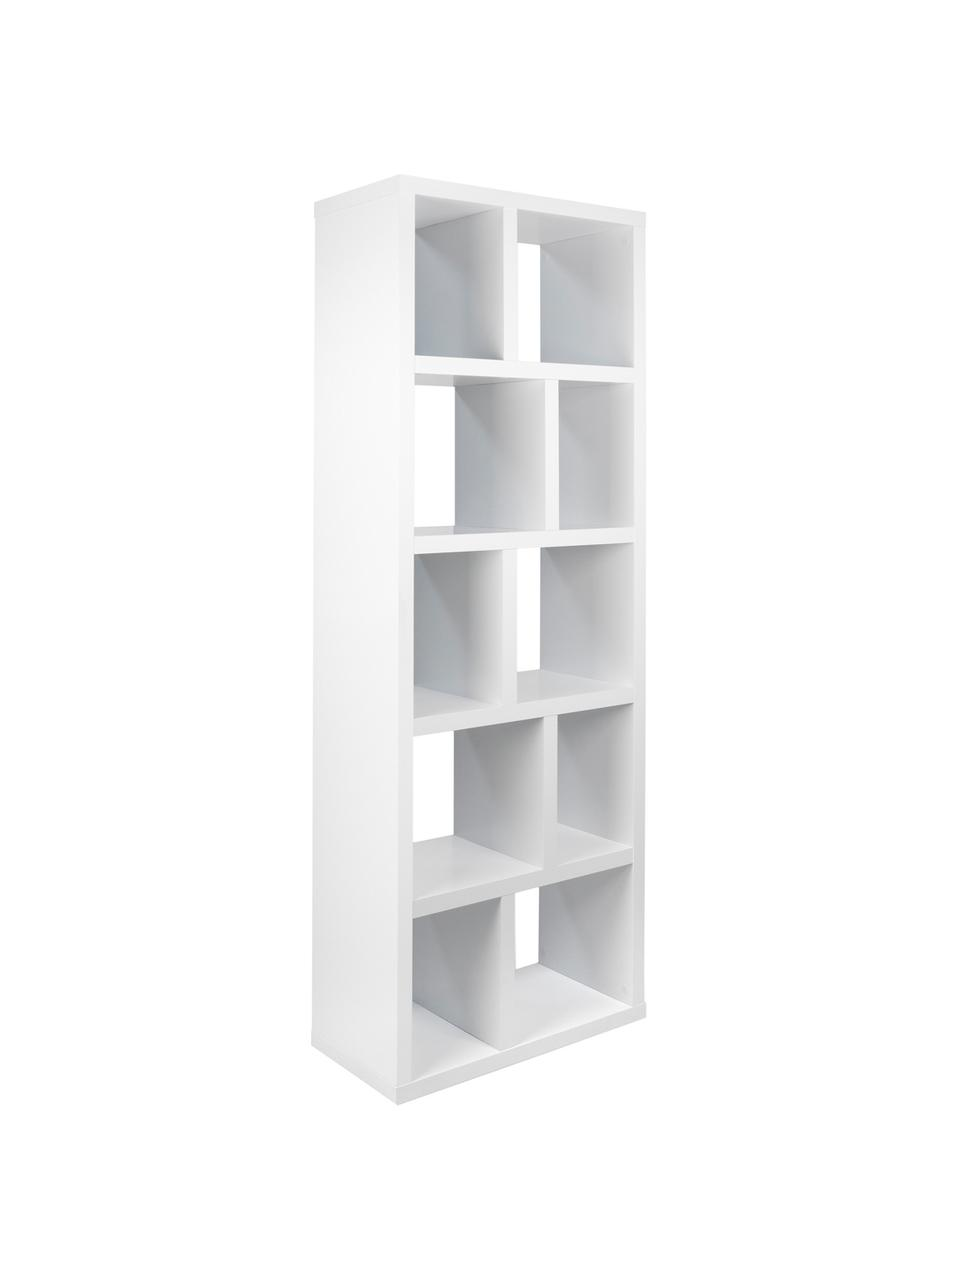 Bücherregal Portlyn in Weiß, Oberfläche: Melaminschicht., Weiß, matt, 70 x 198 cm